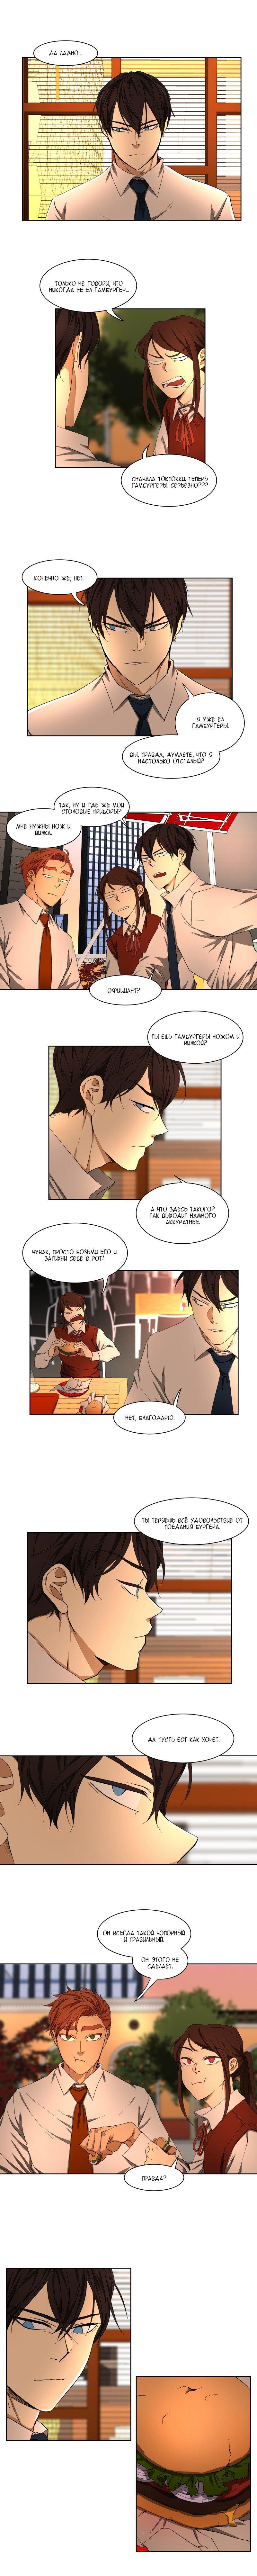 Манга Я люблю Ю / I love Yoo  - Том 1 Глава 27 Страница 5